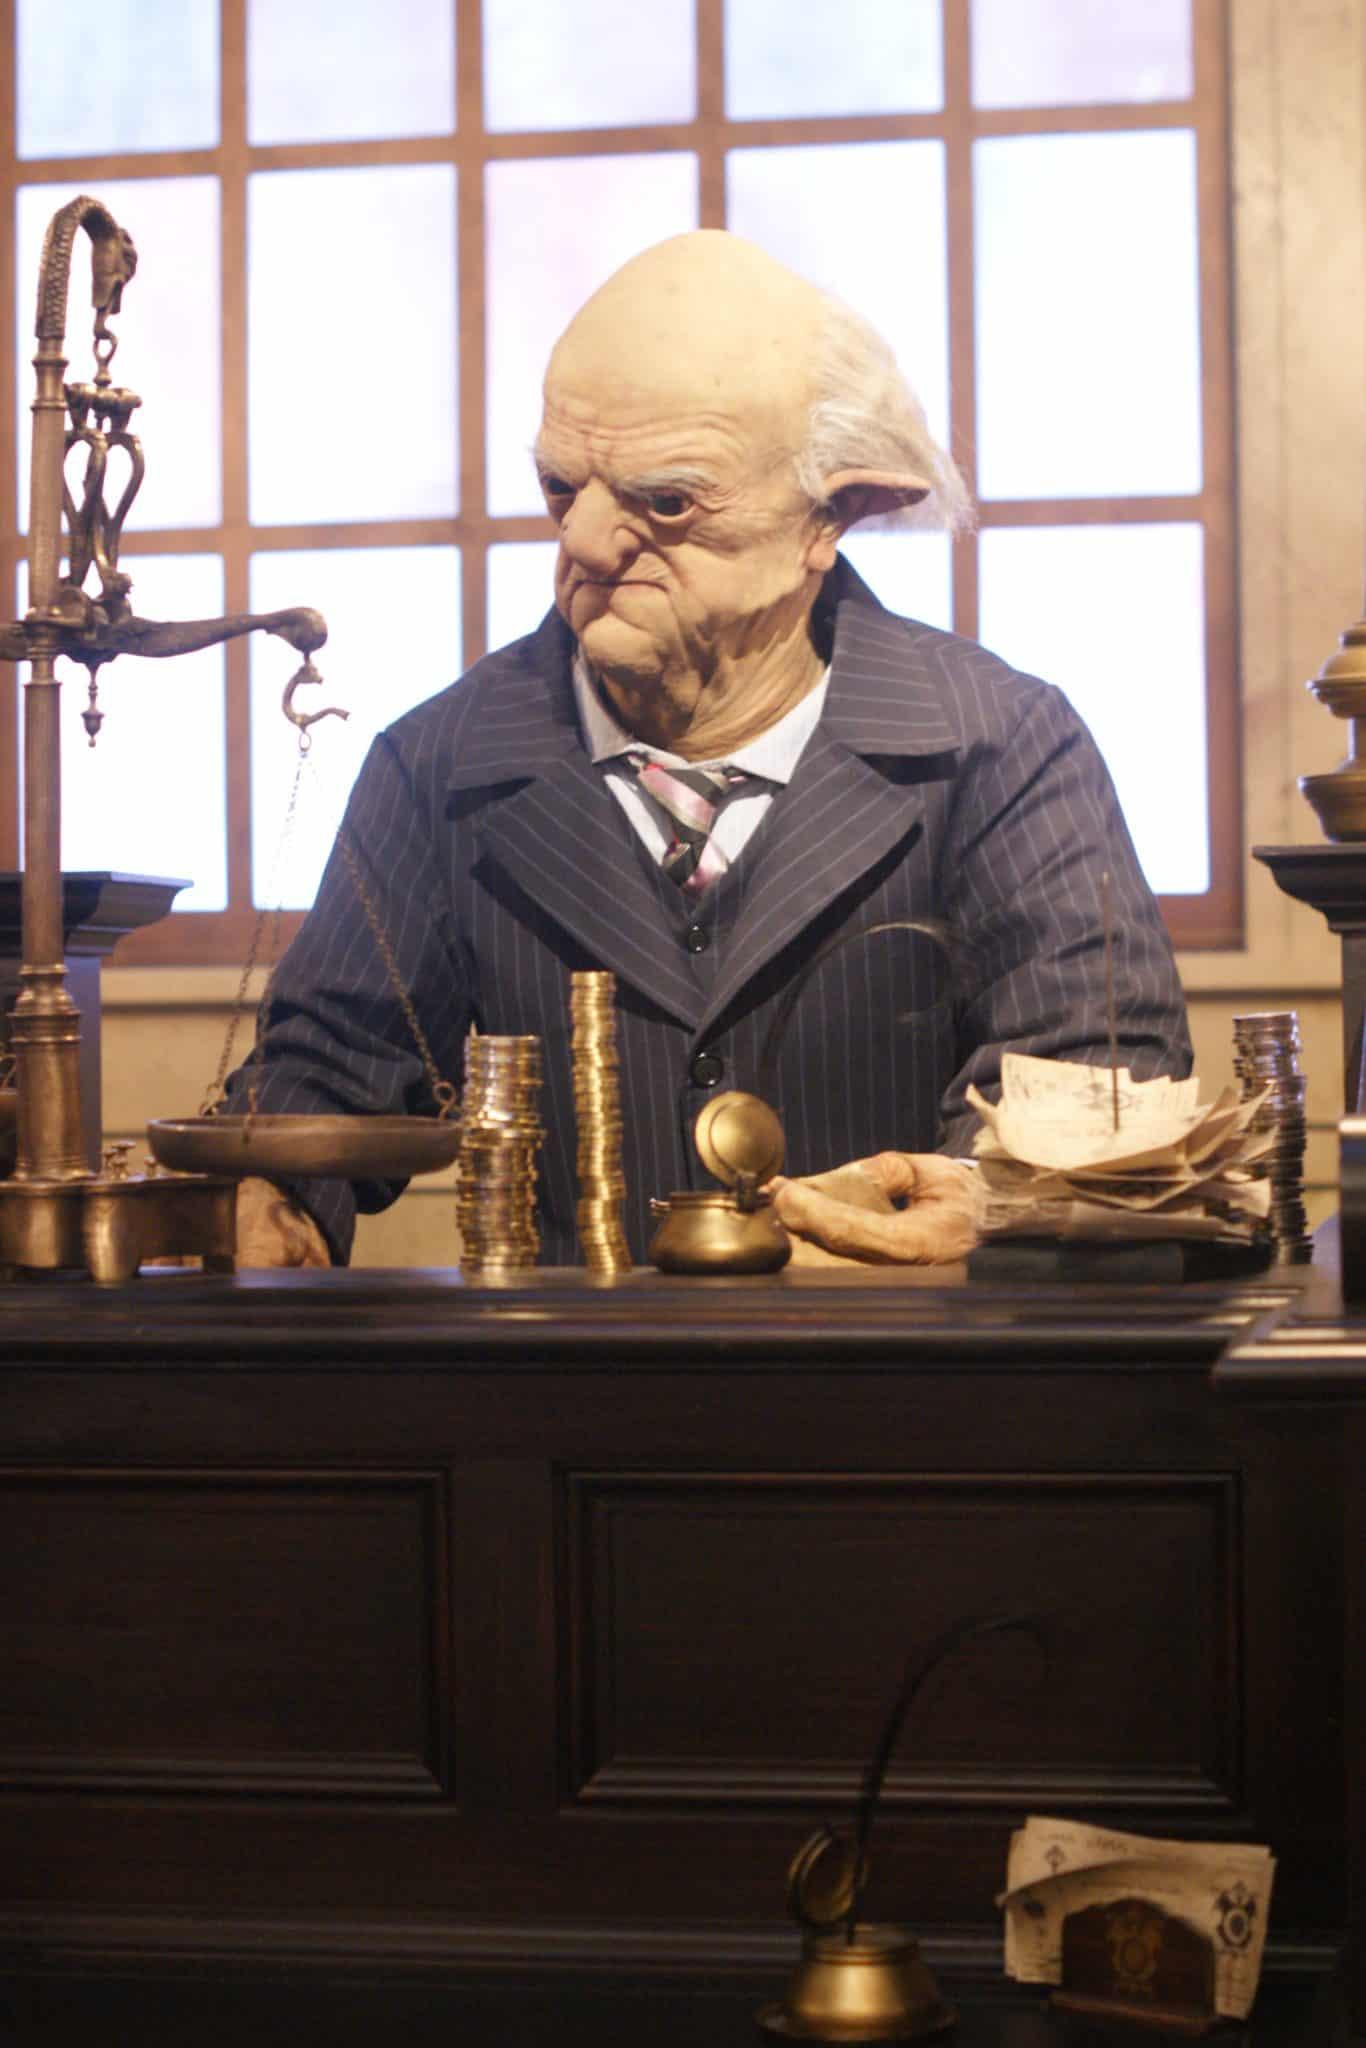 Diagon Alley Goblin in Gringotts Bank - #UniversalStudios #DiagonAlley #Travel #Florida #orlando #Universal